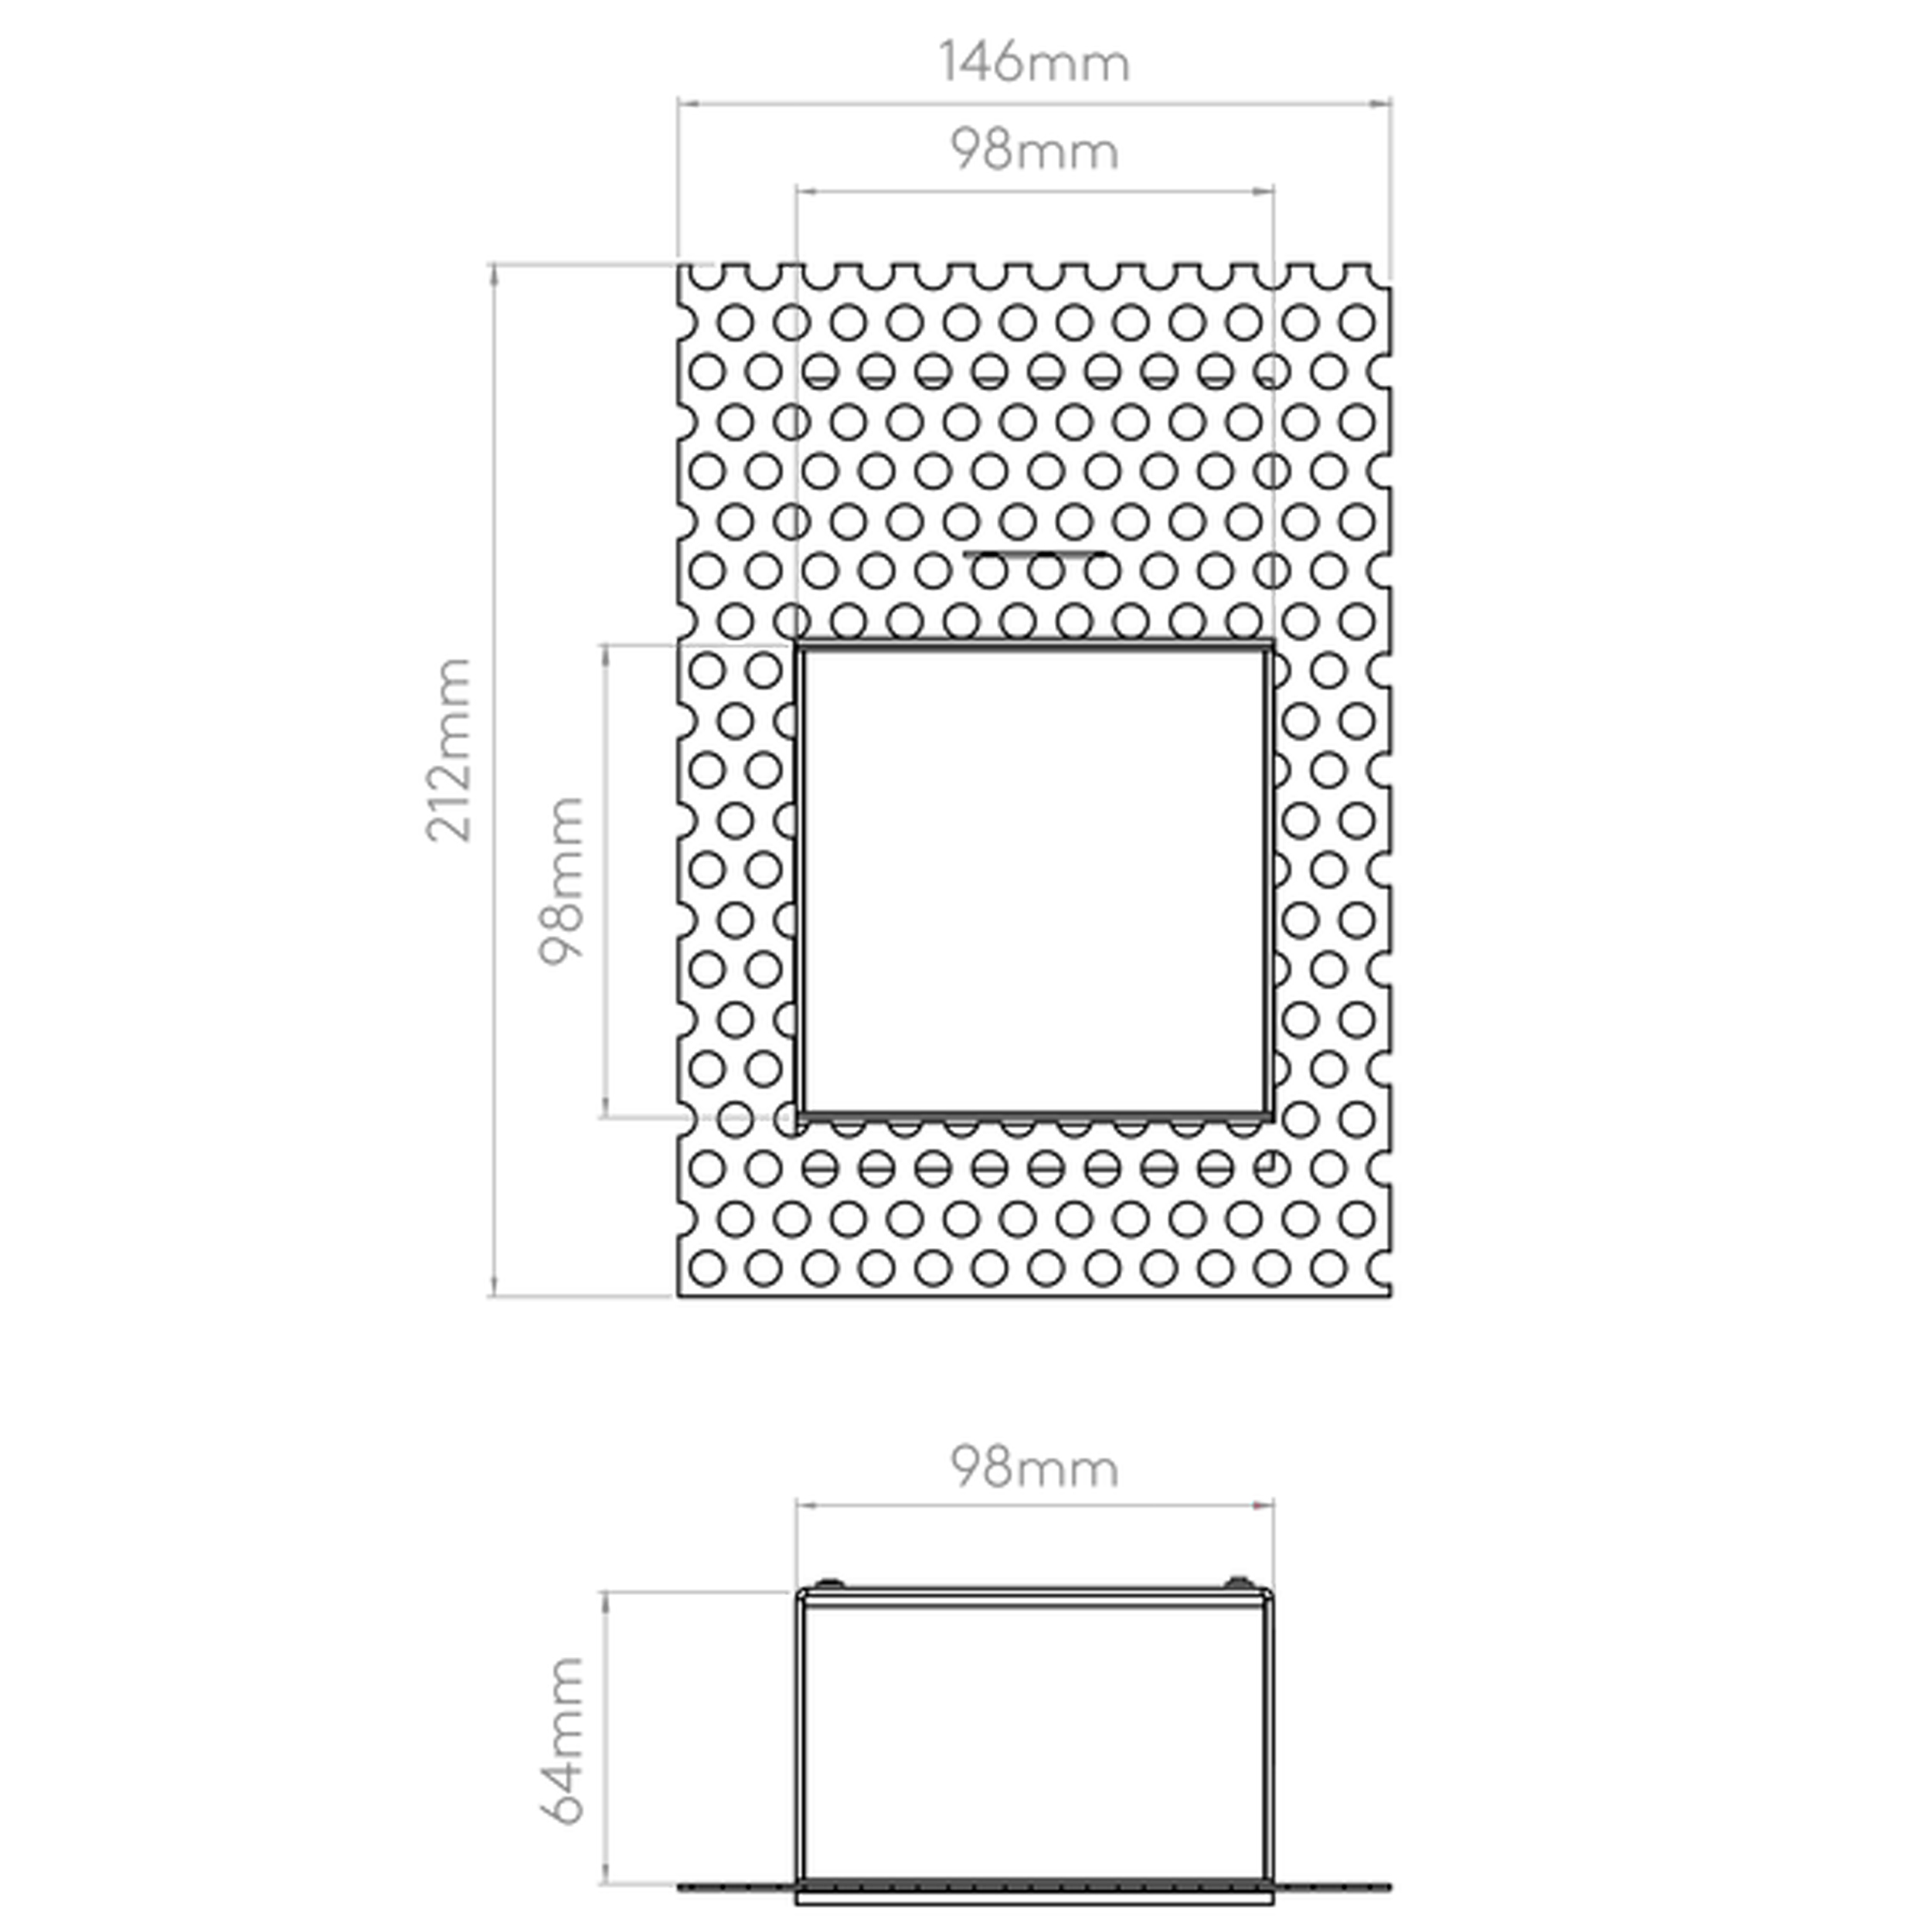 Astro Borgo Trimless 98 Wall Light Line Drawing